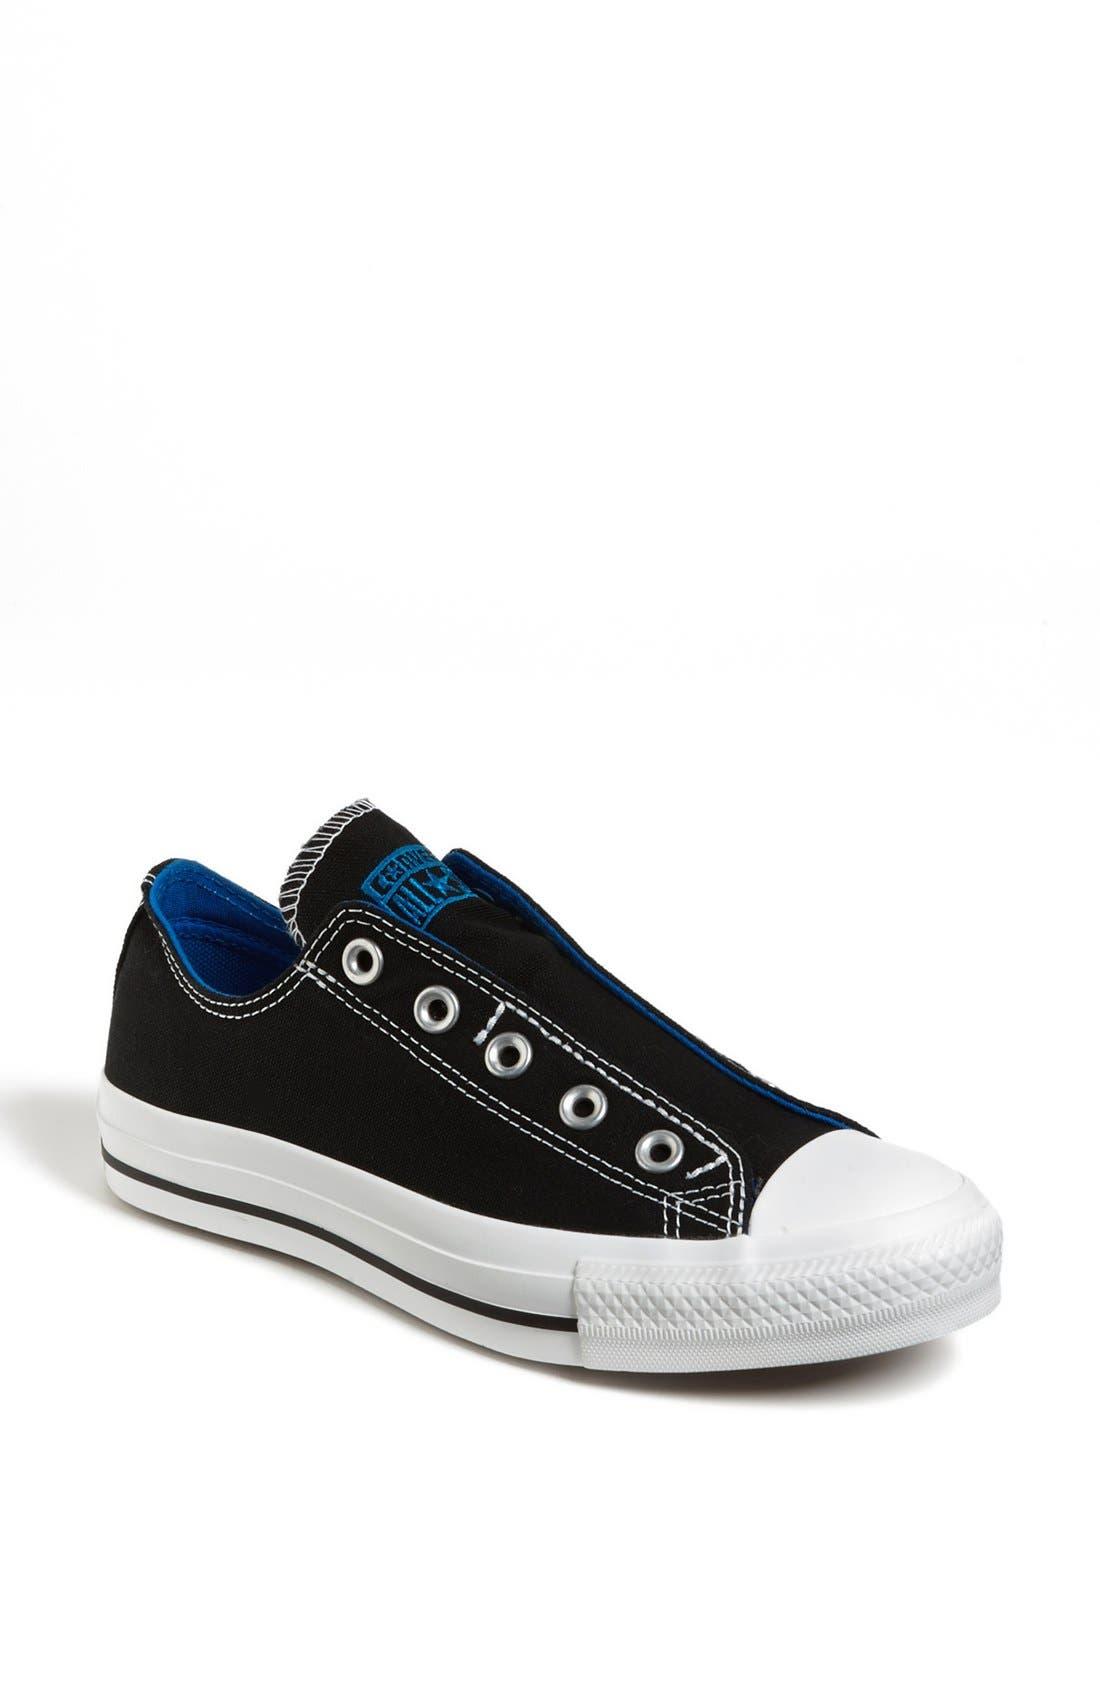 Alternate Image 1 Selected - Converse Chuck Taylor® Slip-On Sneaker (Women)